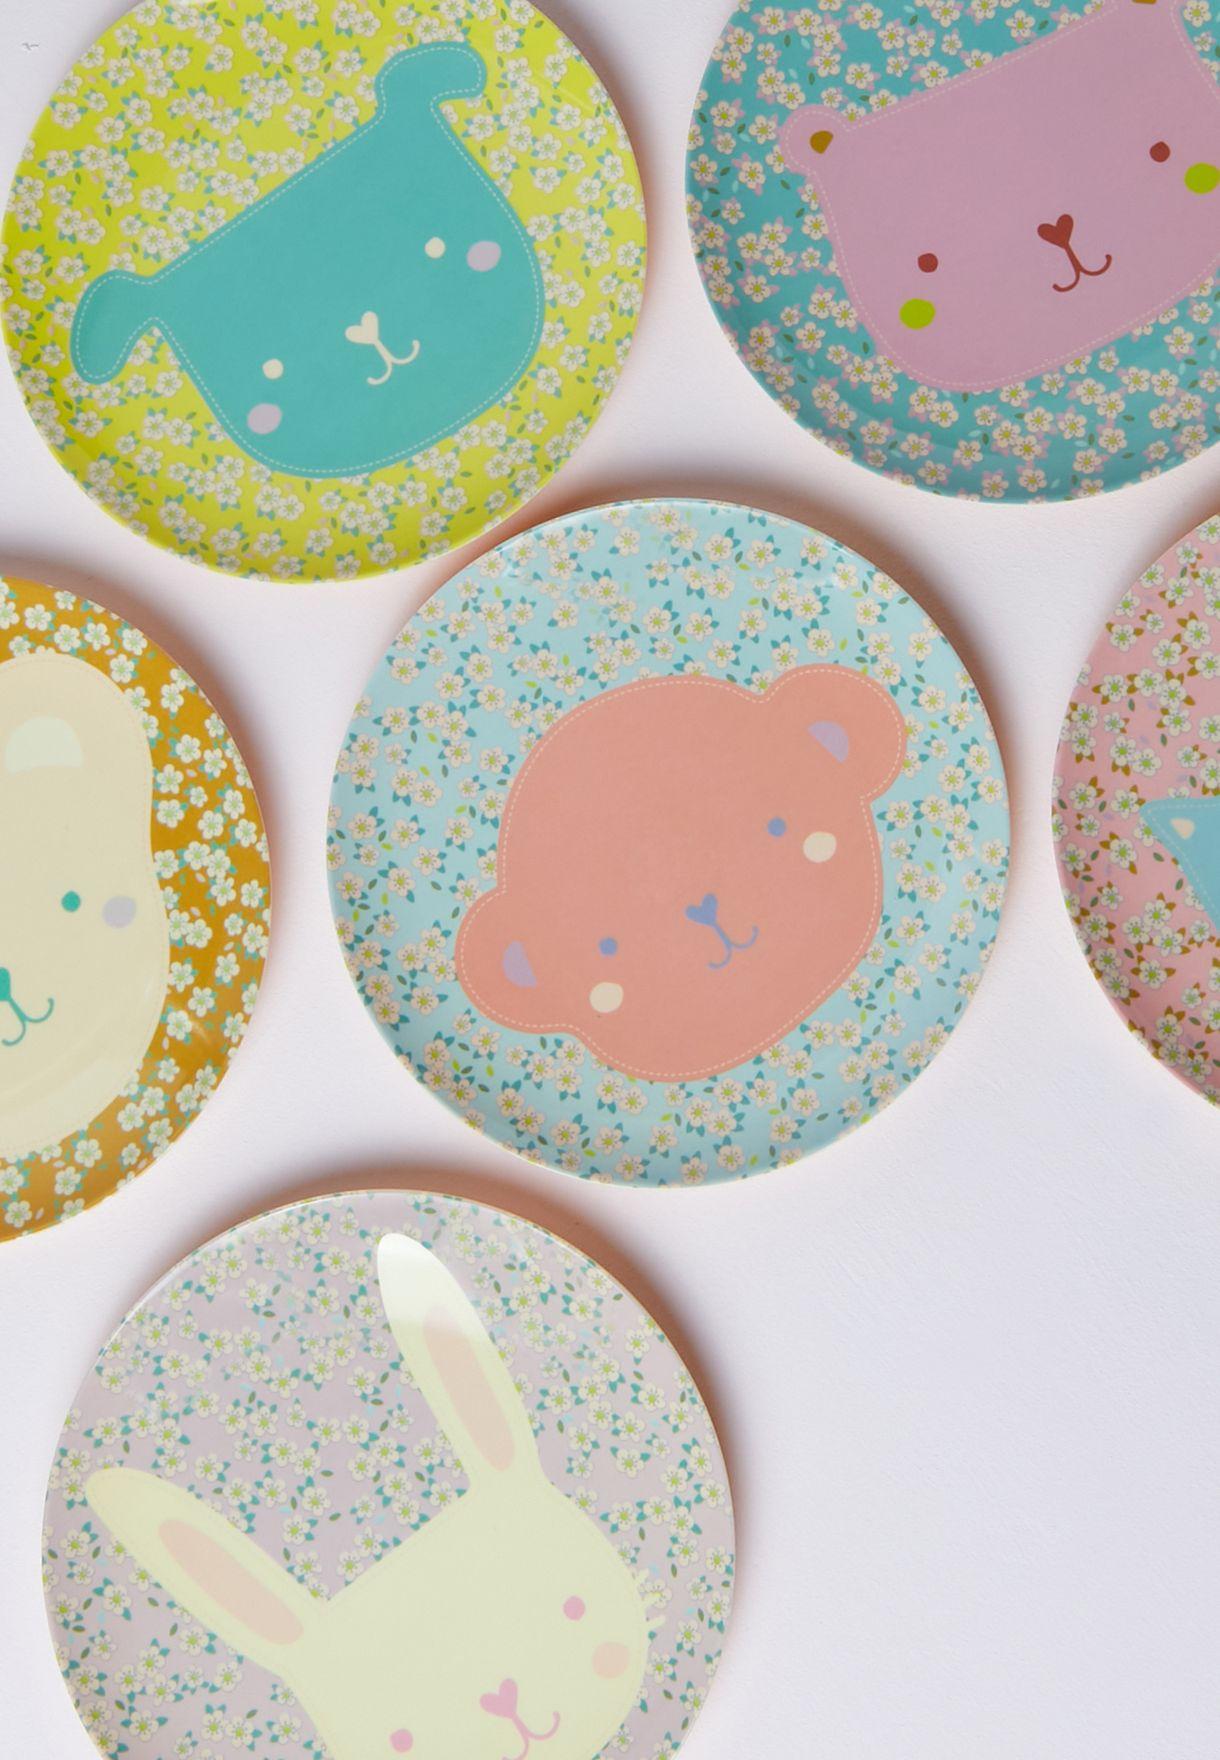 Set Of 6 Animal Printed Melamine Plates